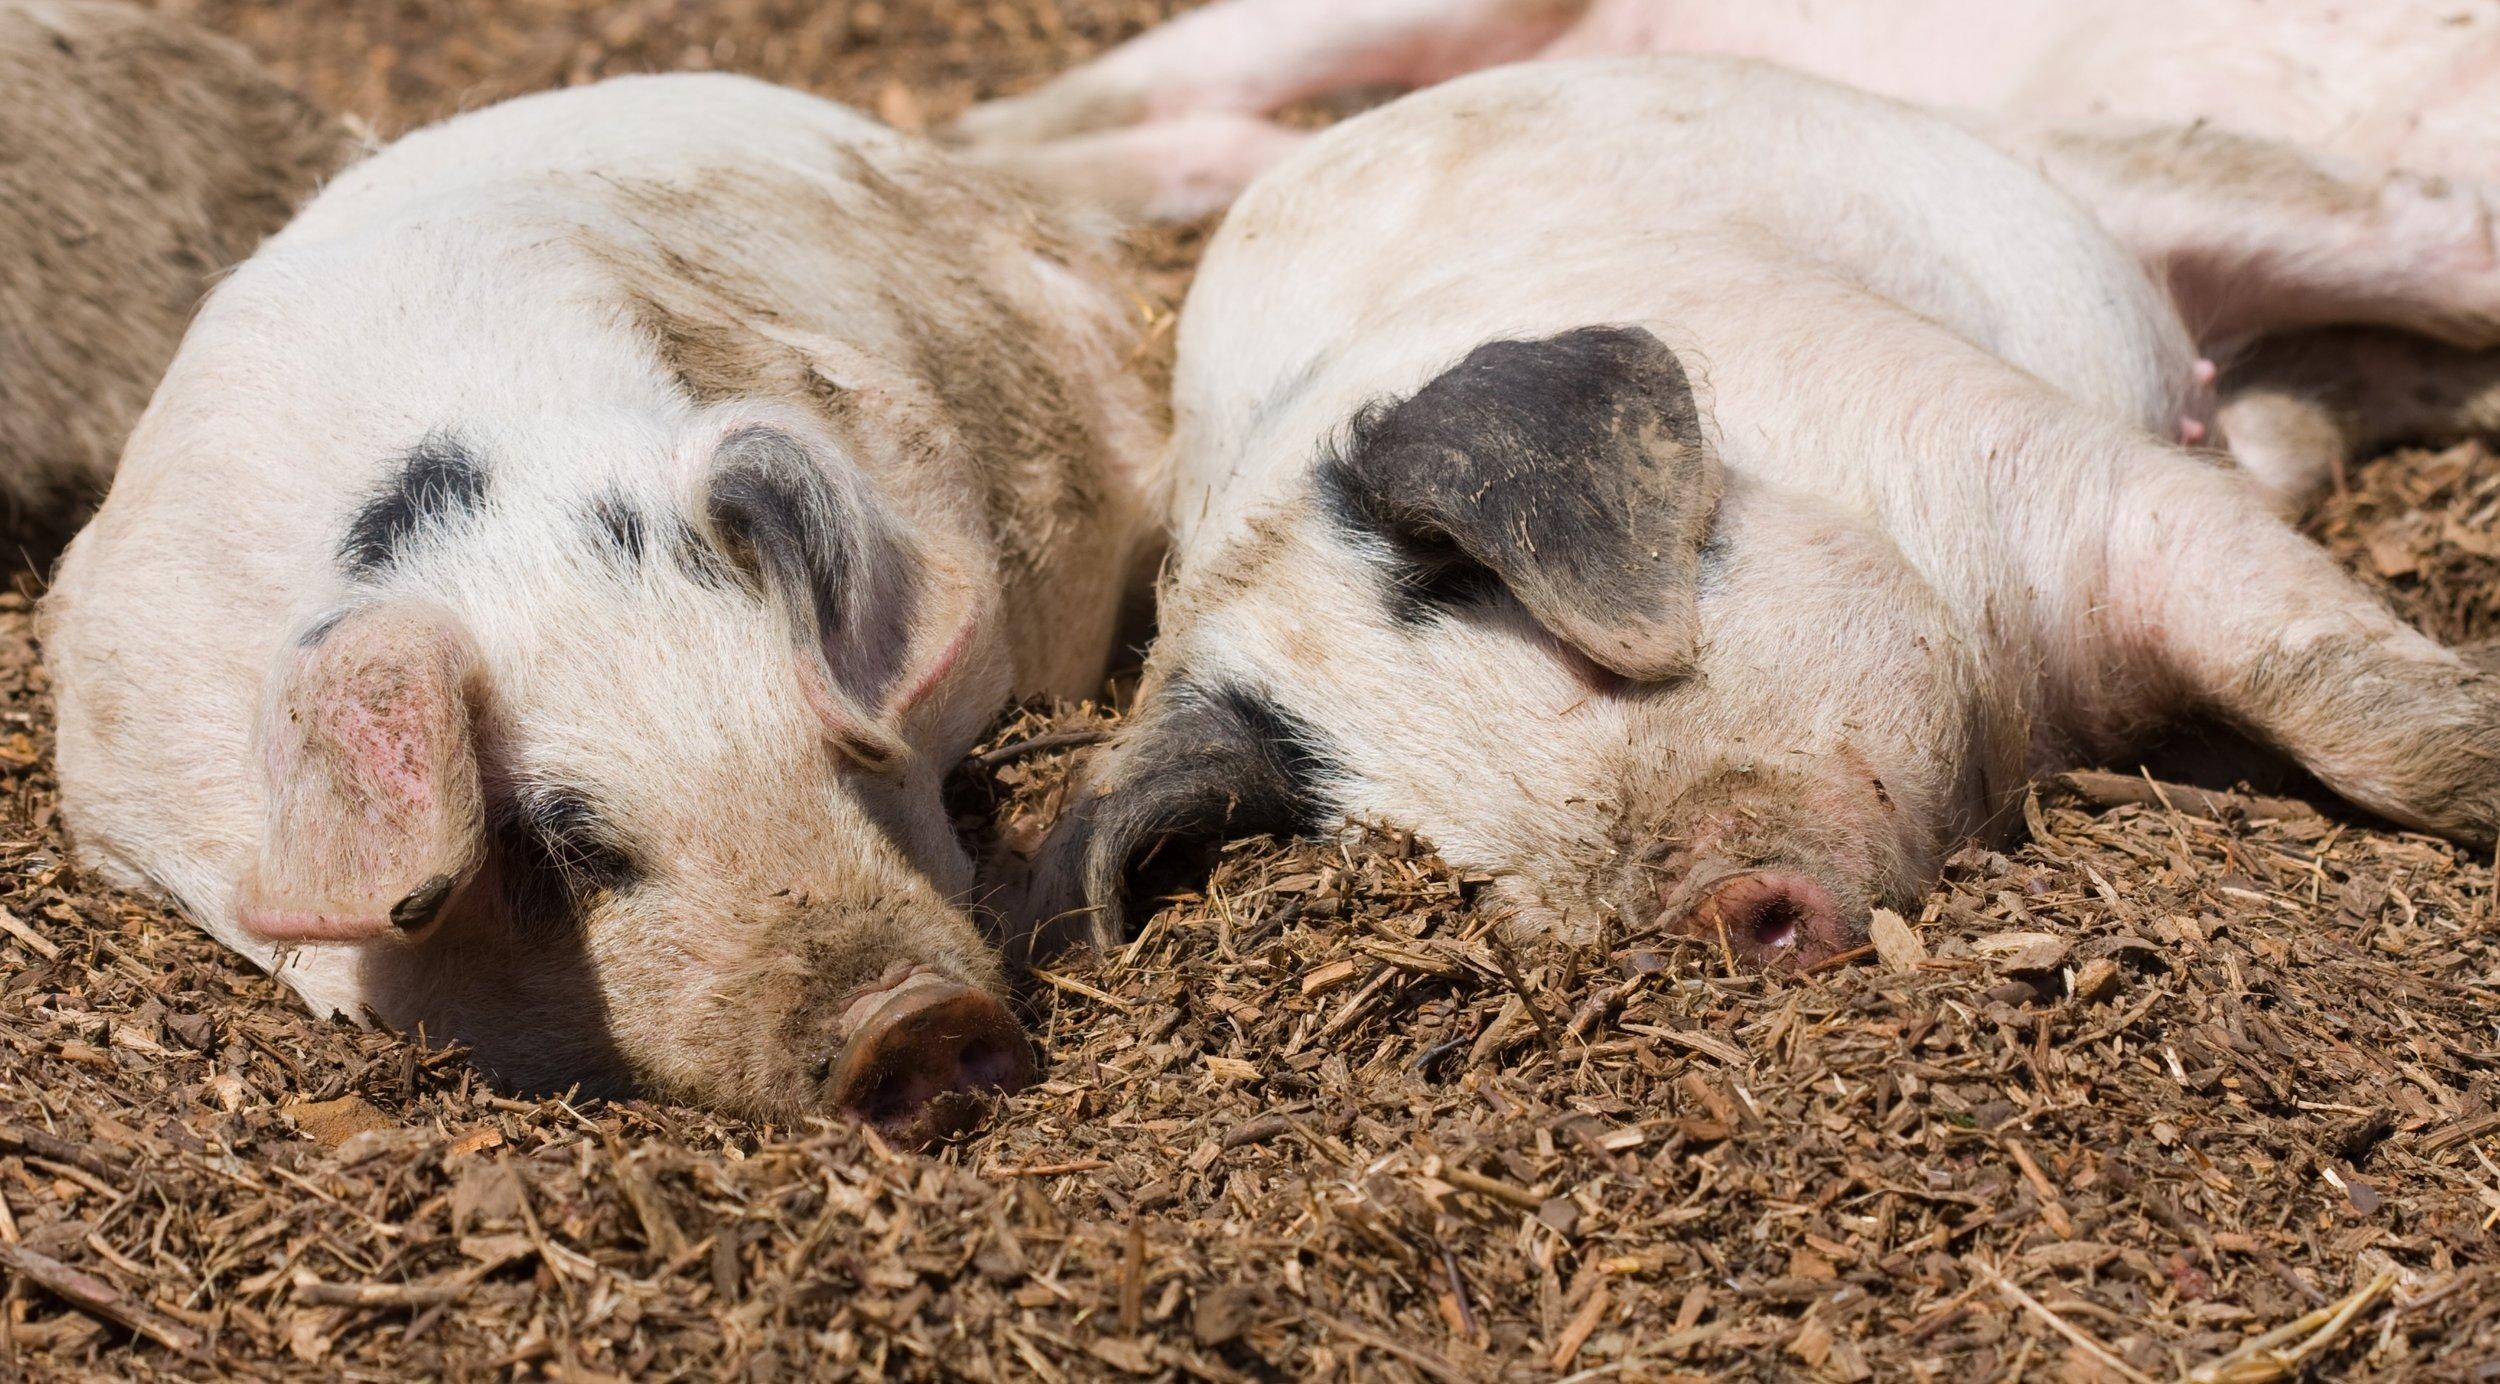 -absolutely_free_photos-original_photos-small-pigs-in-farm-3465x1918_82890.jpg